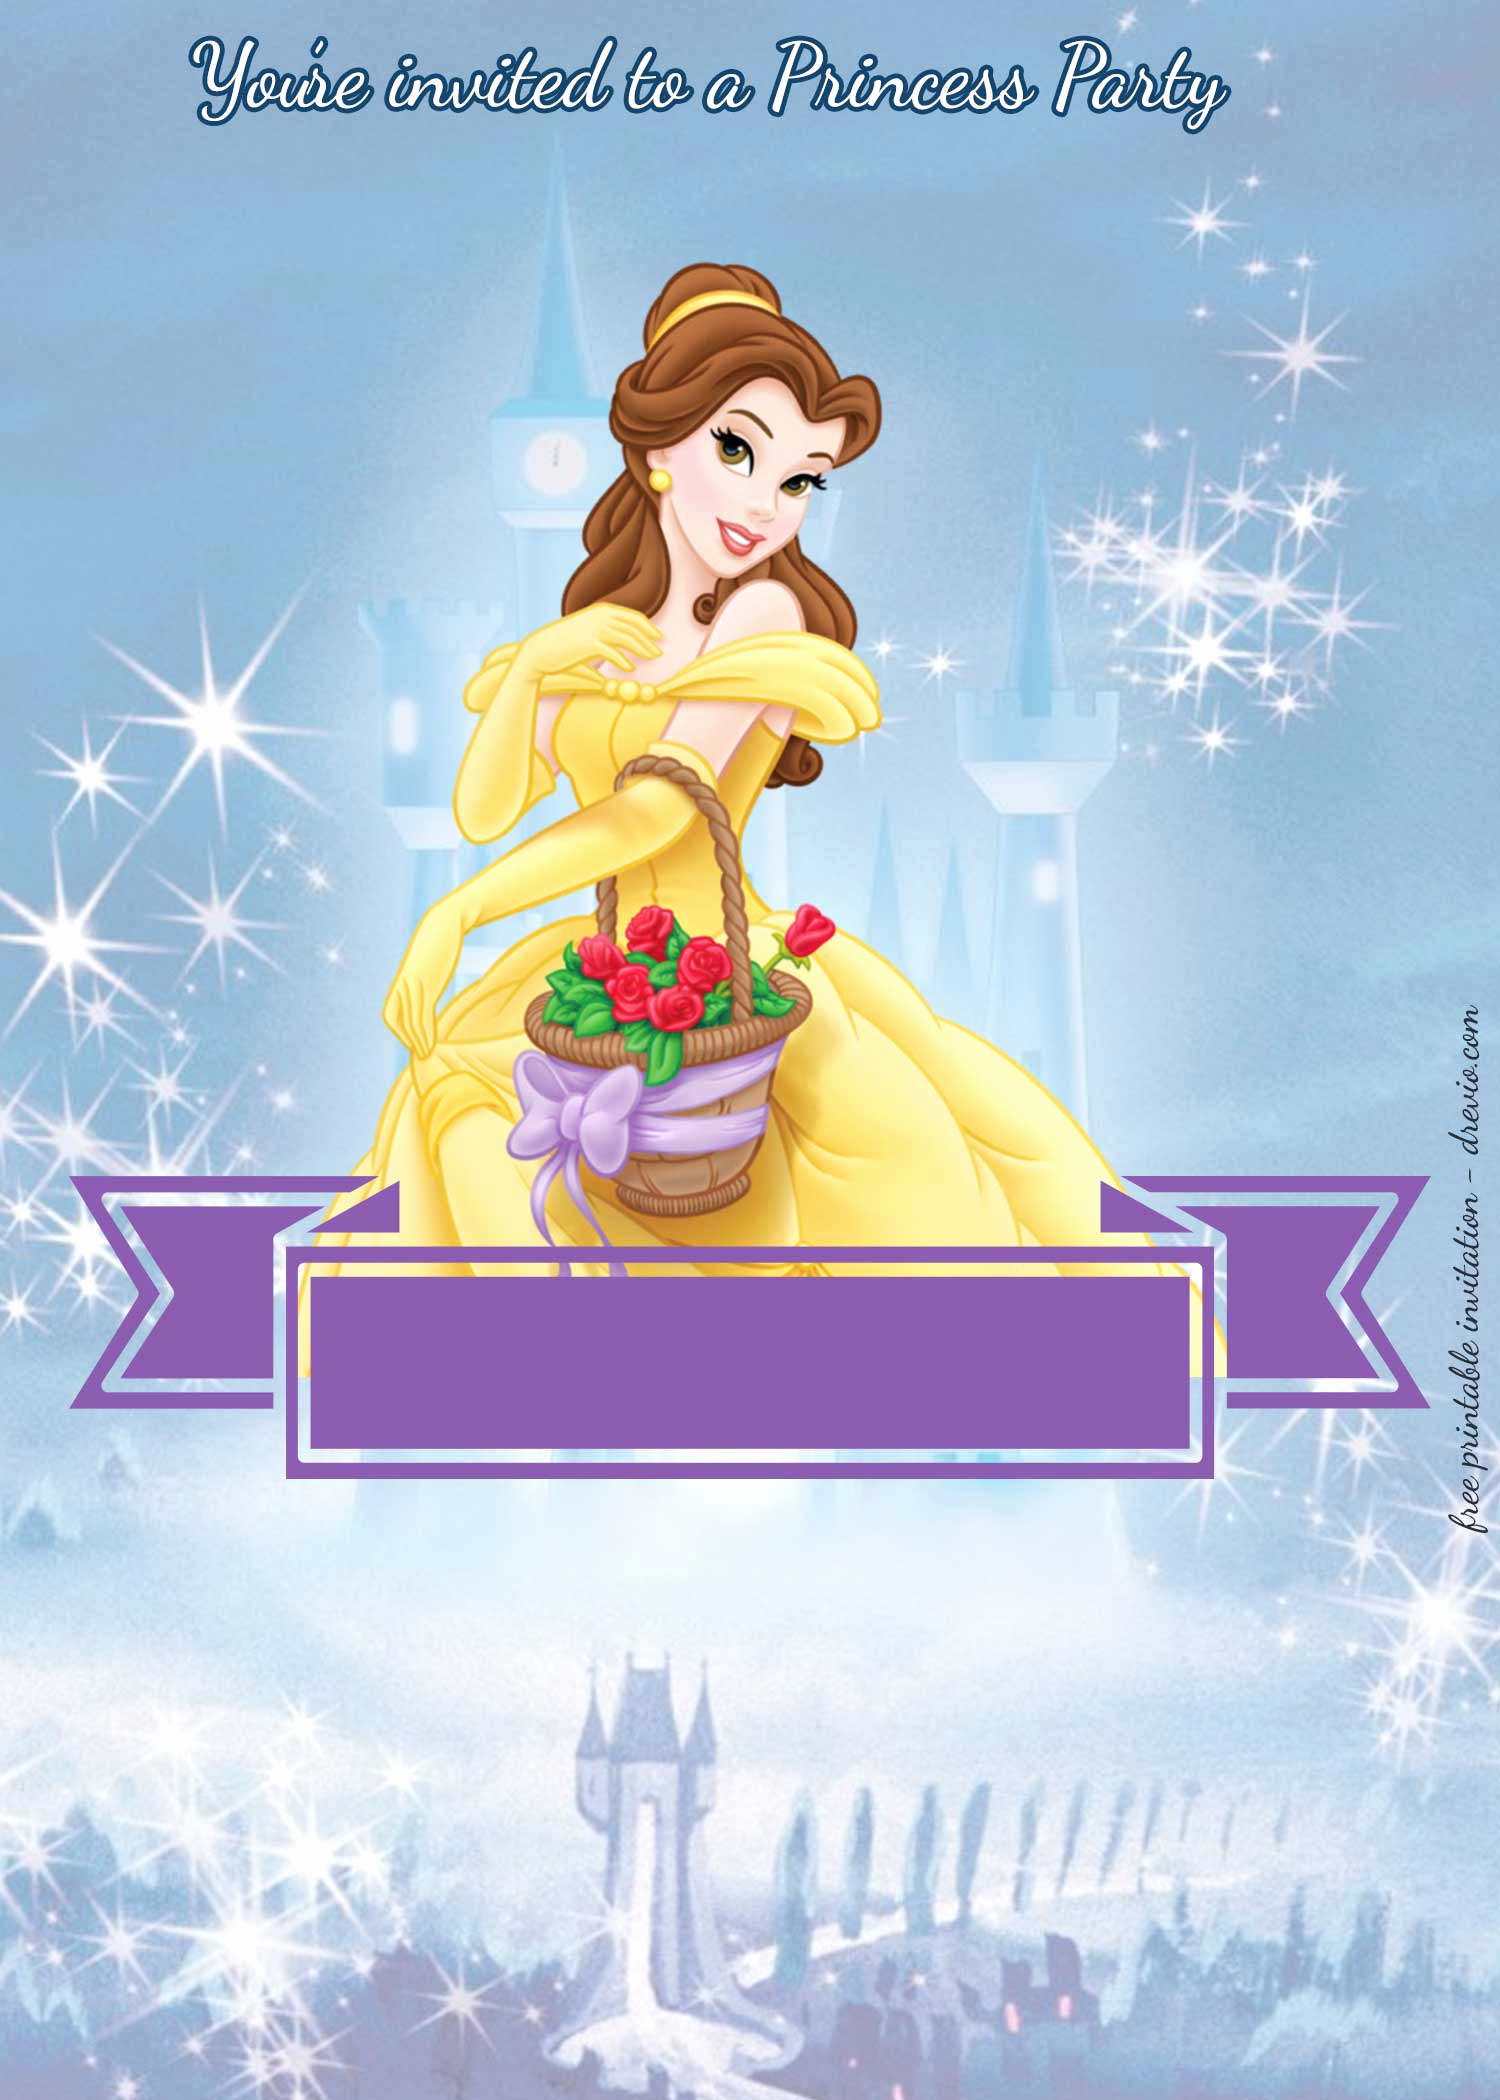 Free Princess Invitation Template New Free Princess Party Birthday Invitation Templates